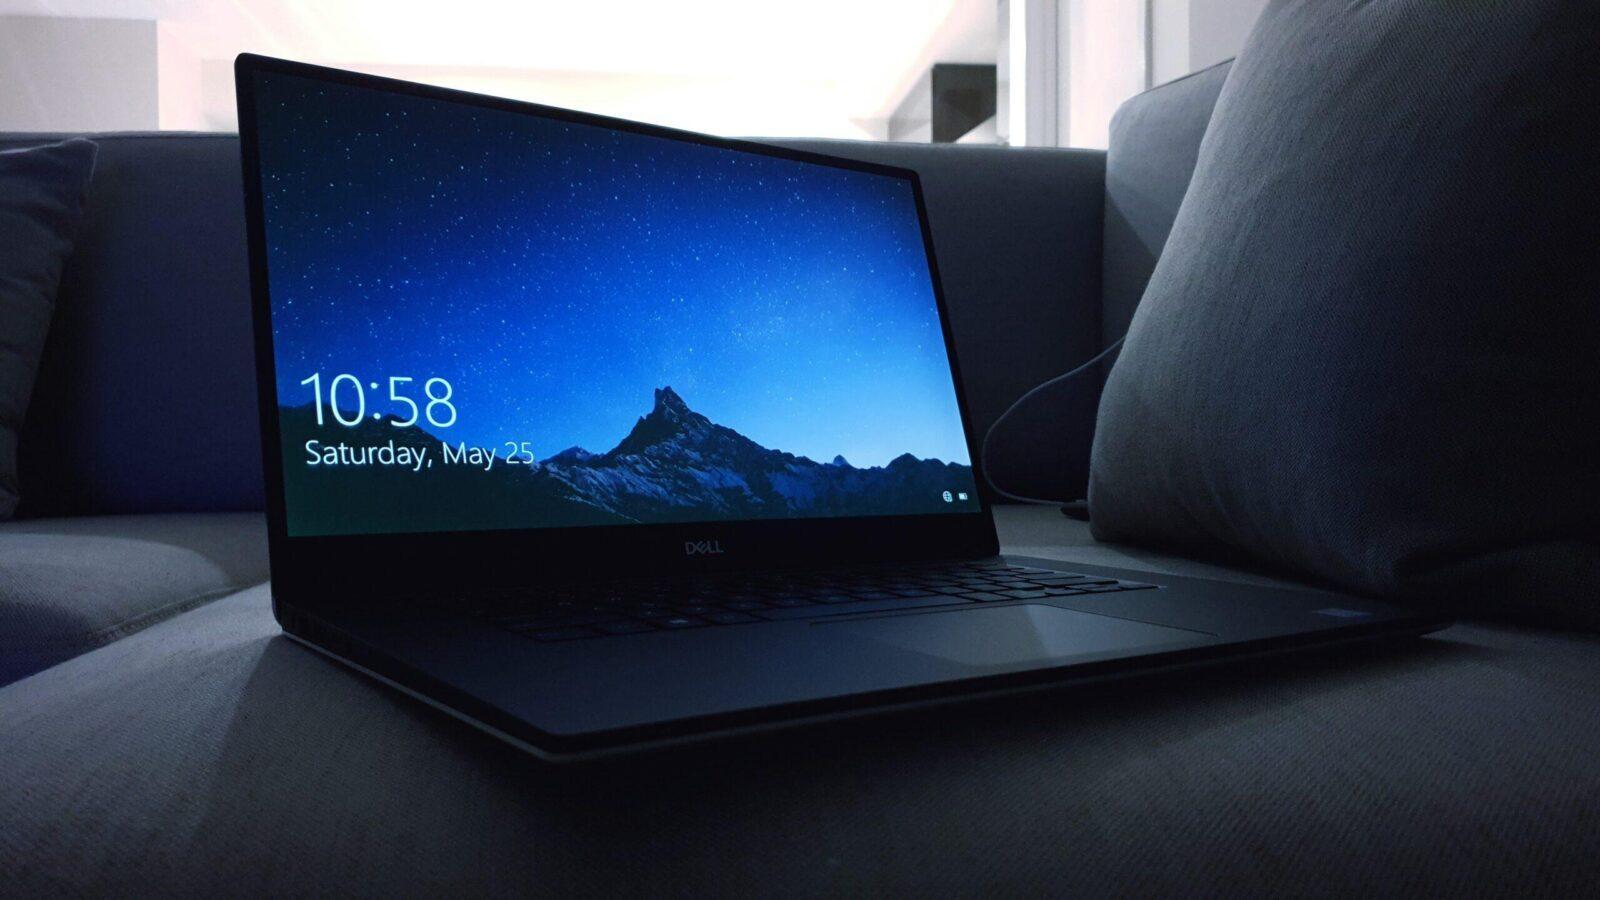 black Dell laptop on sofa